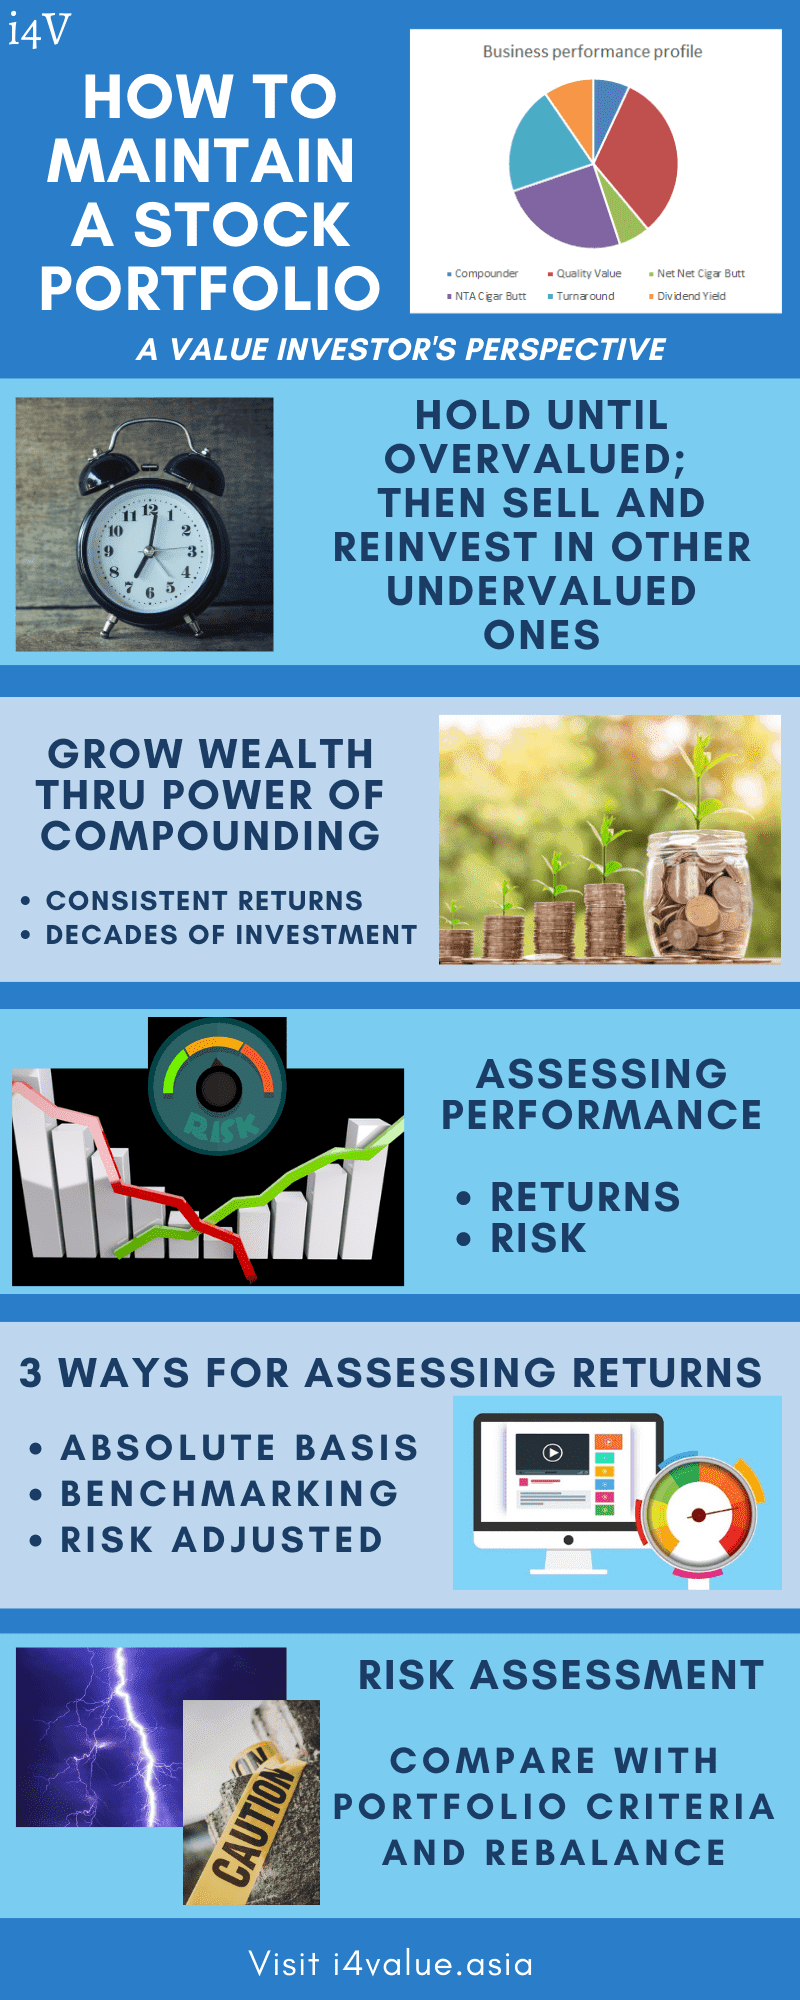 Baby steps in managing a stock portfolio